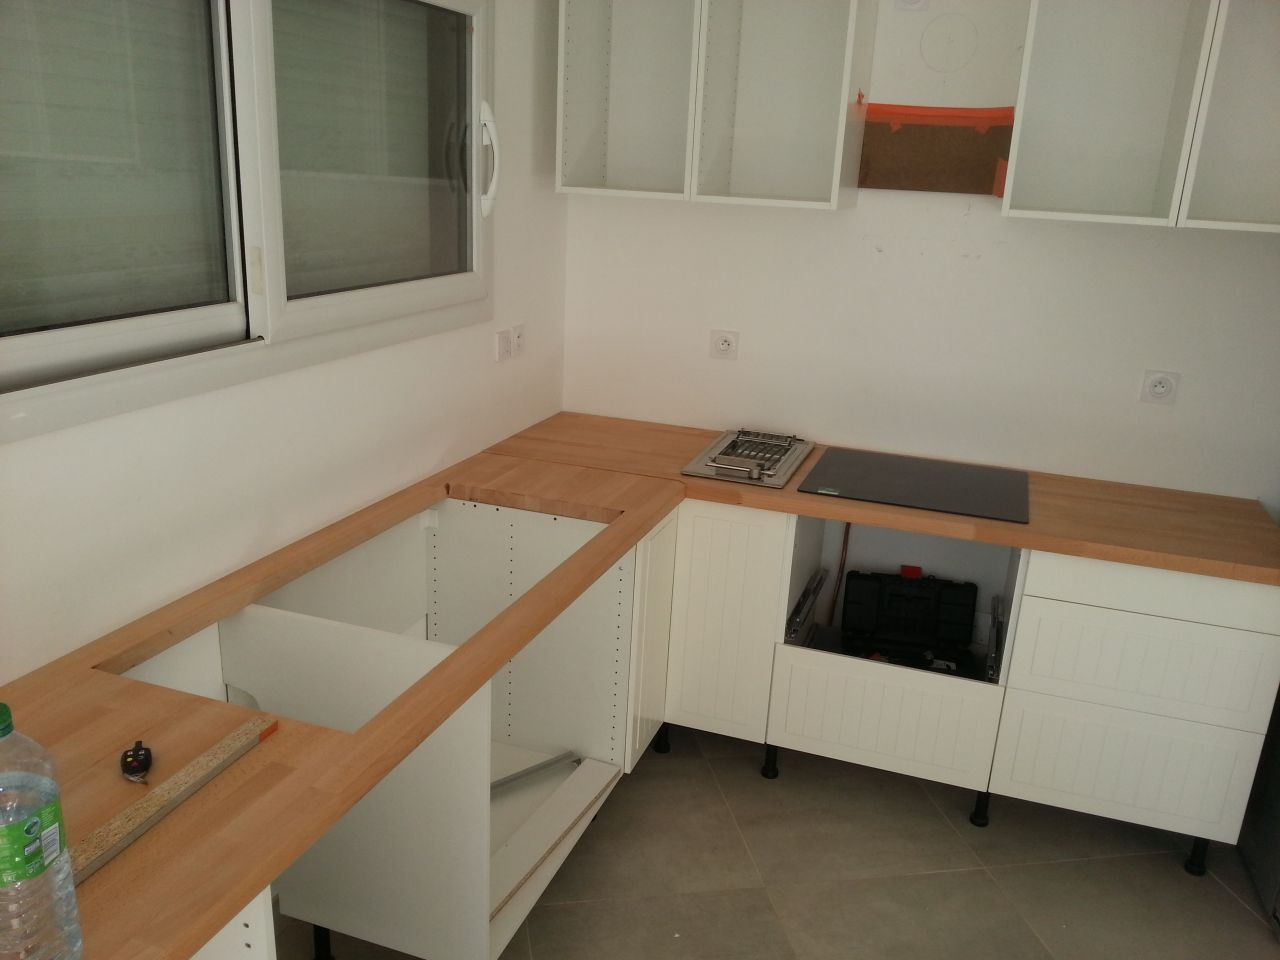 Fabriquer meuble salle de bain avec plan de - Meuble sous plan de travail ...